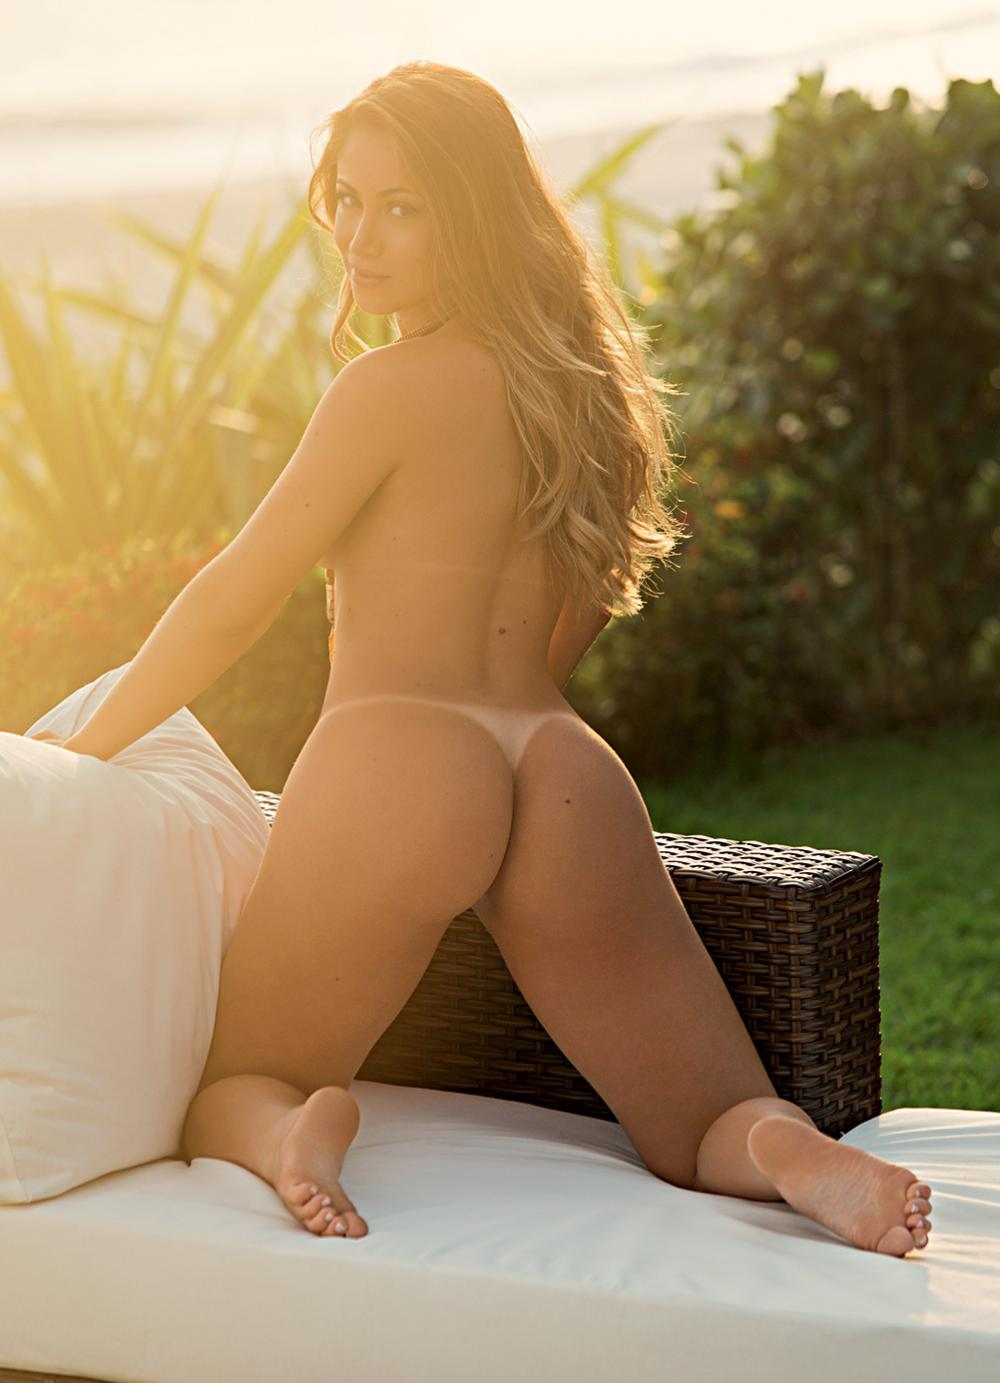 nudes (74 photo), Cleavage Celebrity photos